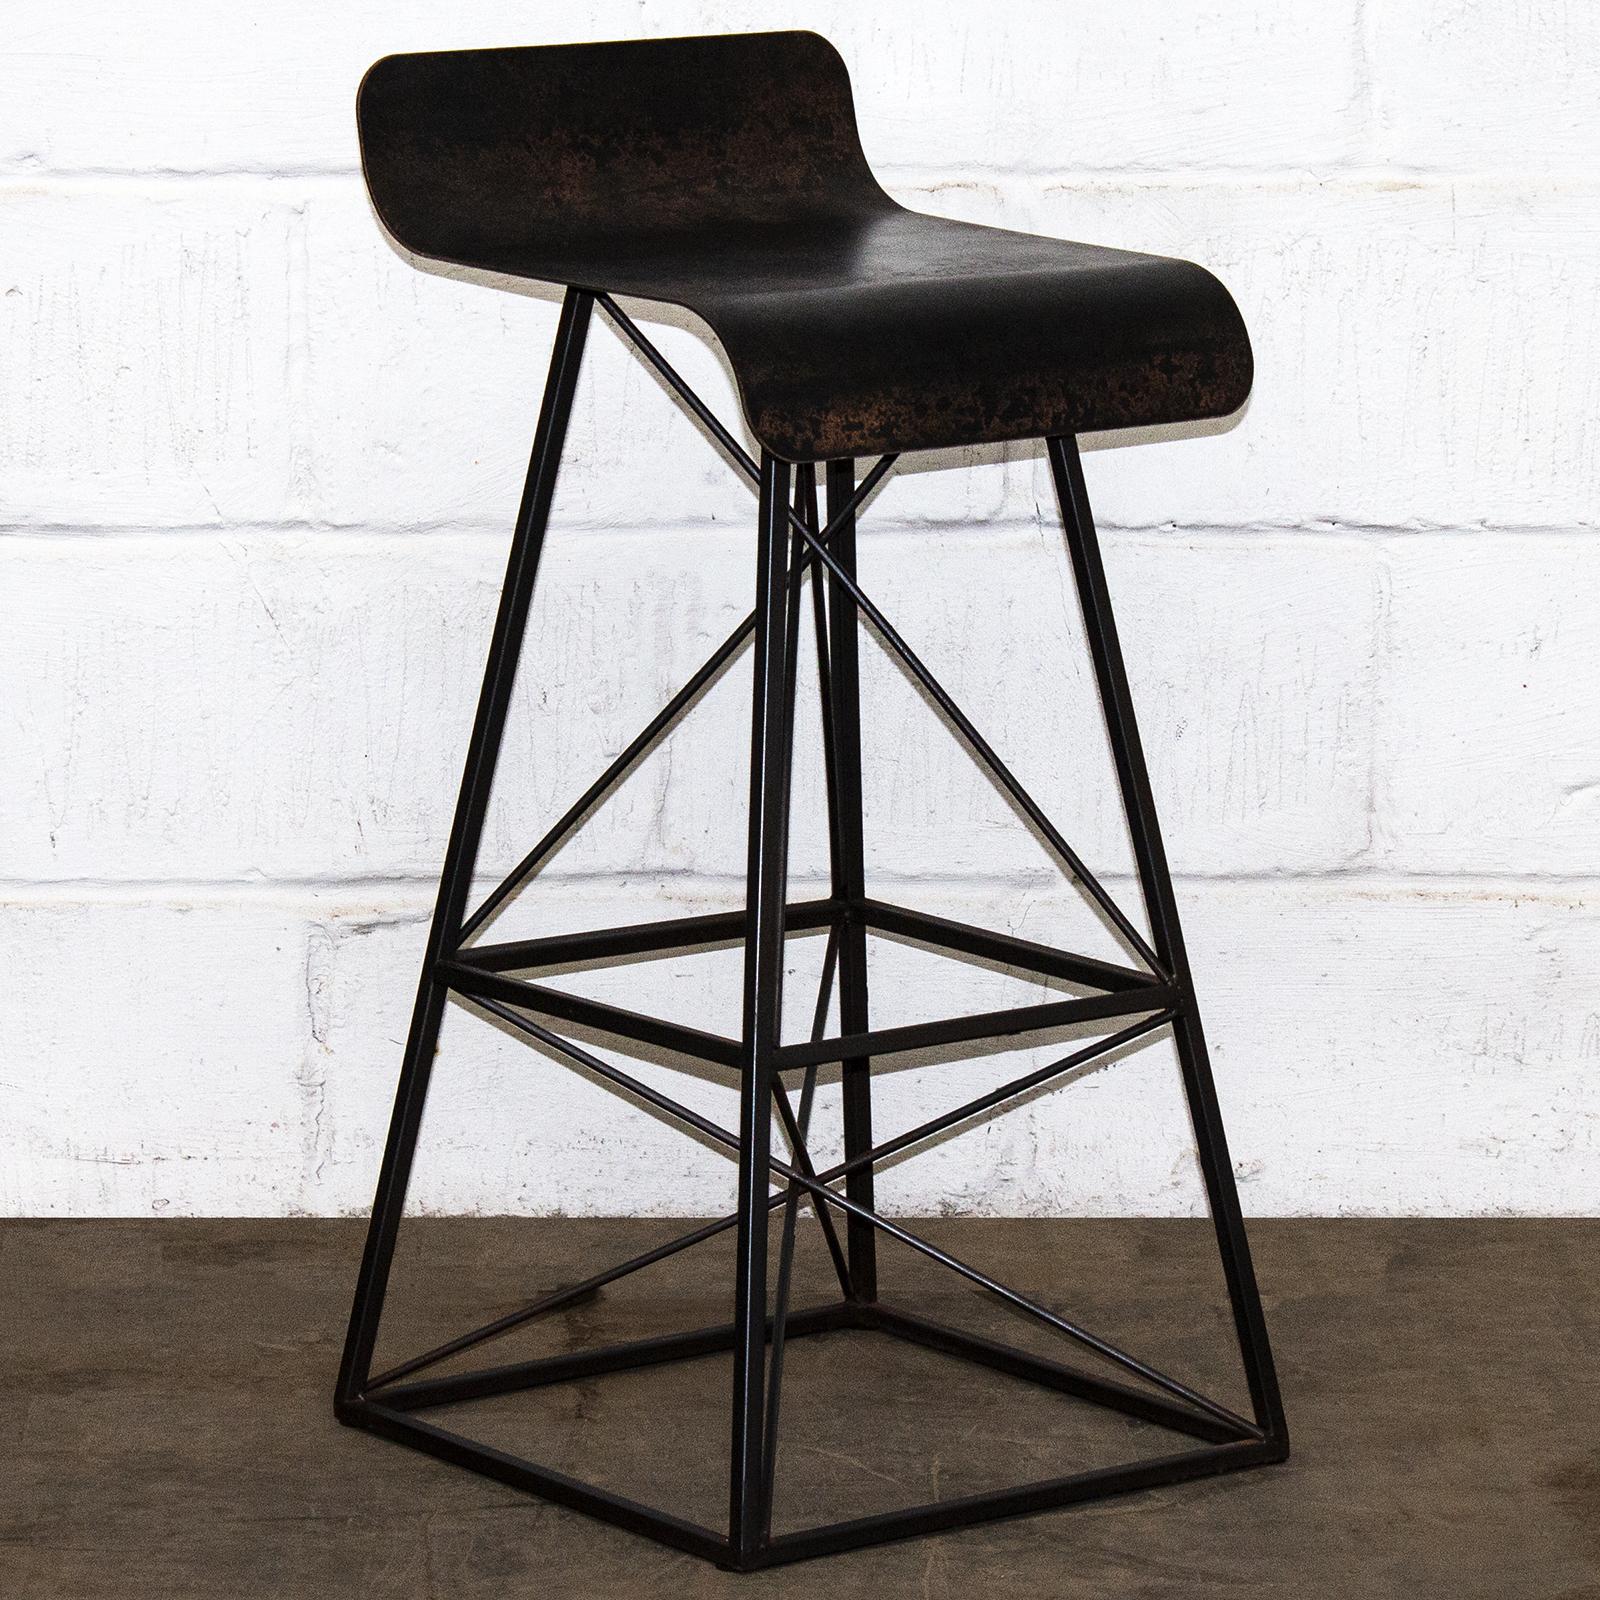 Sensational Details About Metal Bar Stool Rustic Vintage Seat Industrial Retro Seating Breakfast Chair Ibusinesslaw Wood Chair Design Ideas Ibusinesslaworg